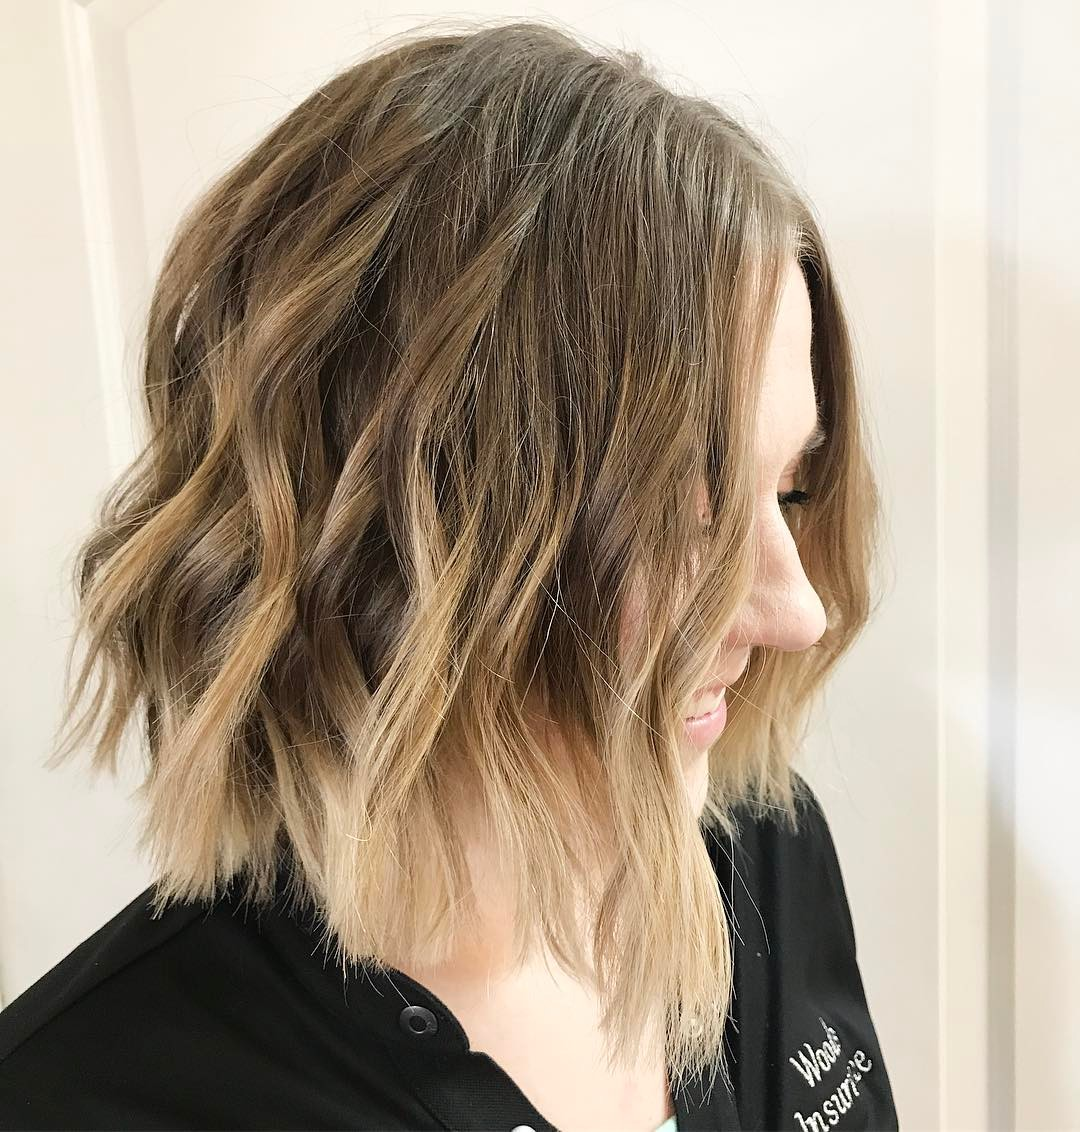 Simple-easy-bob-hairstyle-3 Modern Bob Hairstyles for 2019 – Best Bob Haircut Ideas